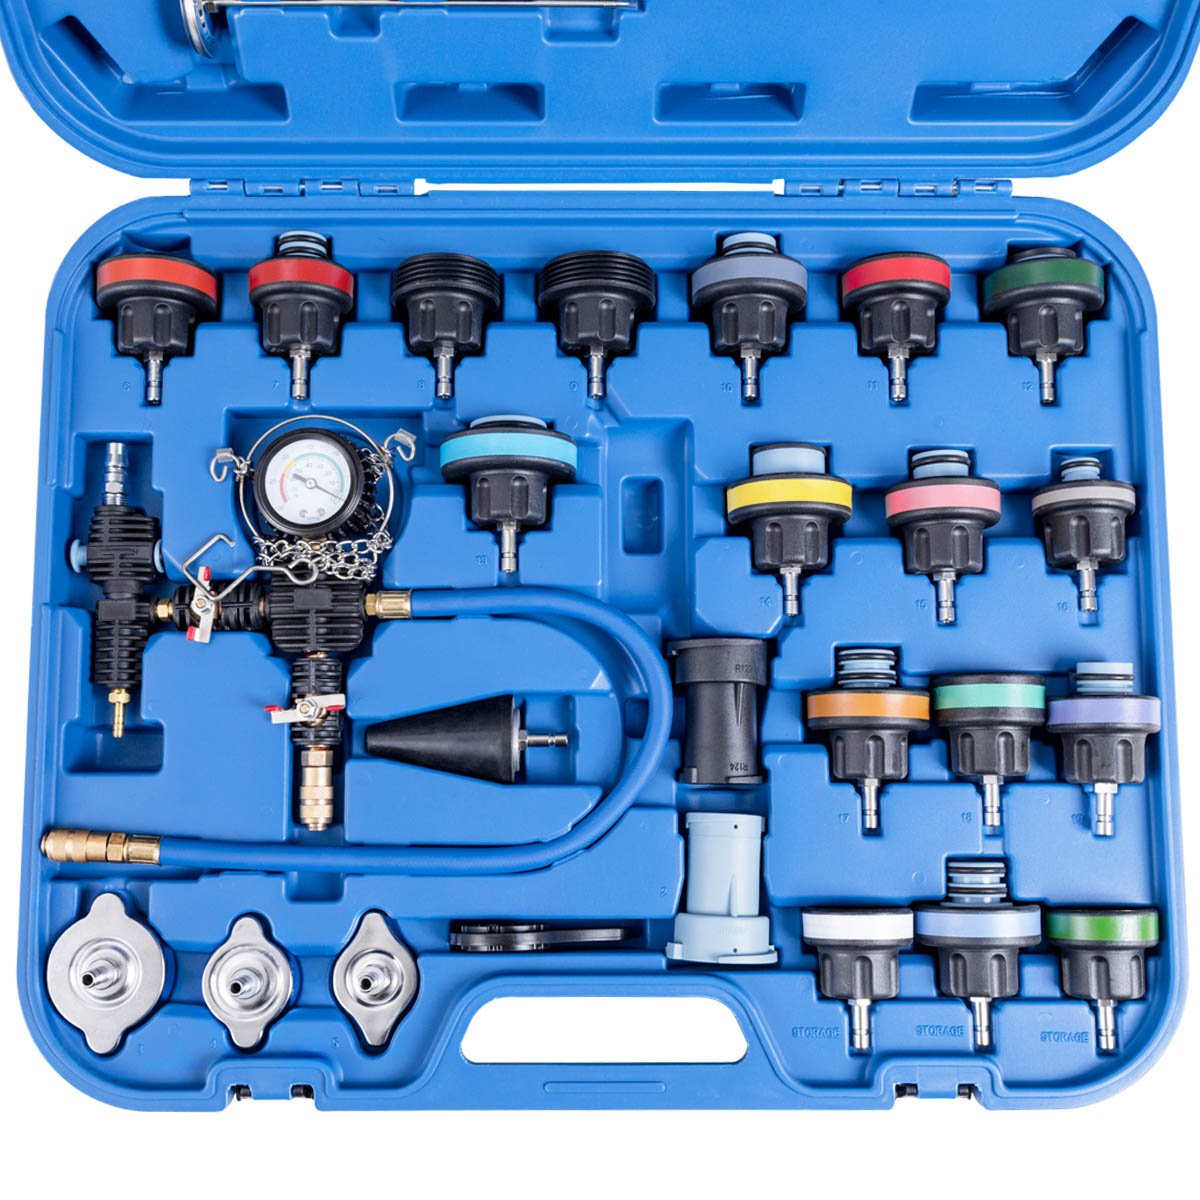 Goplus 28PCS Universal Radiator Pressure Tester Leak Checker Vacuum Type Cooling System Automotive Radiator Pressure Test Kit Purge and Refill Kit Set w/Carrying Case by Goplus (Image #4)